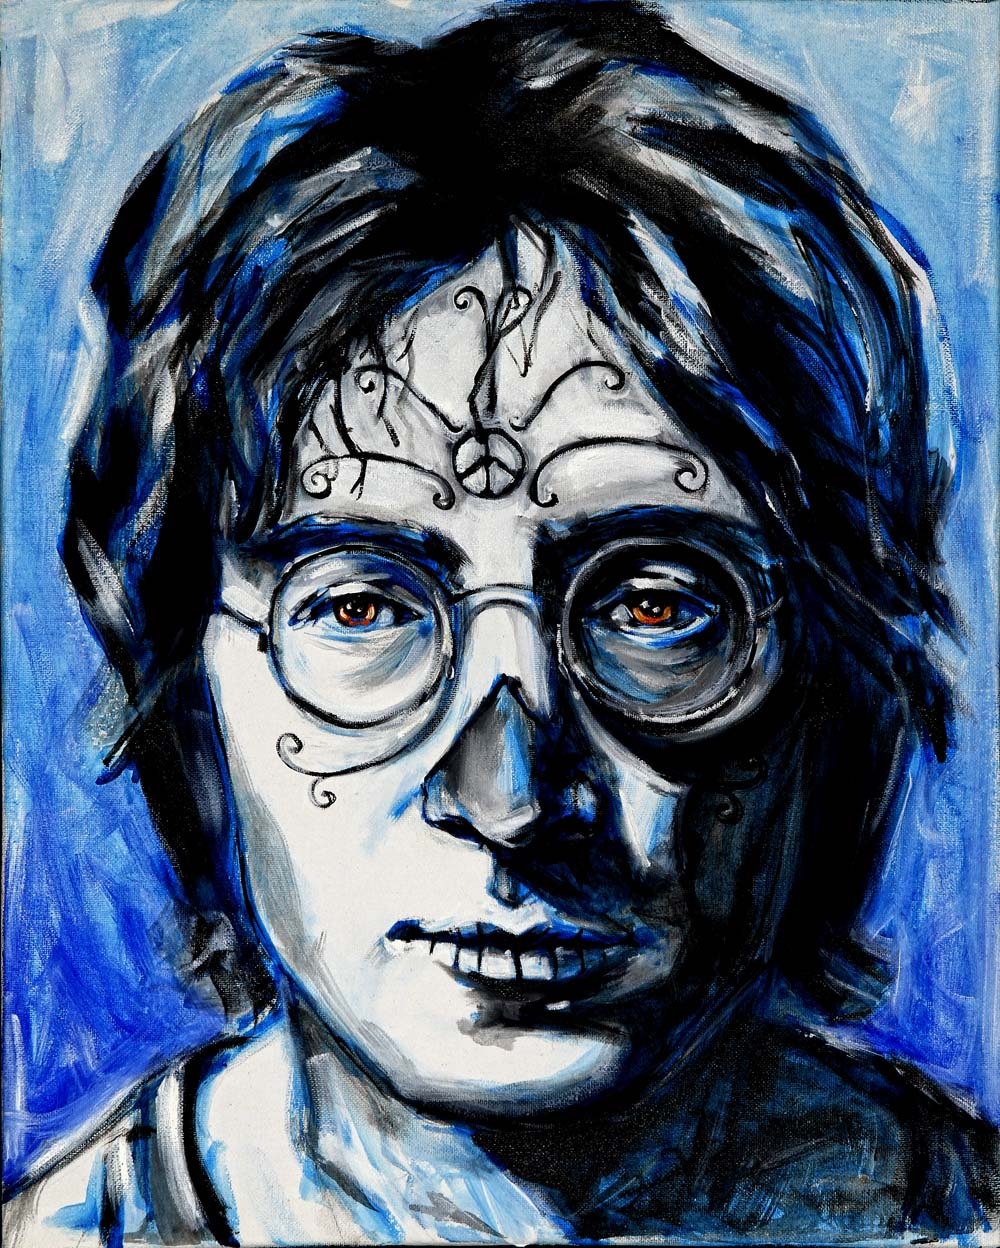 John Lennon, Dia de Los Muertos